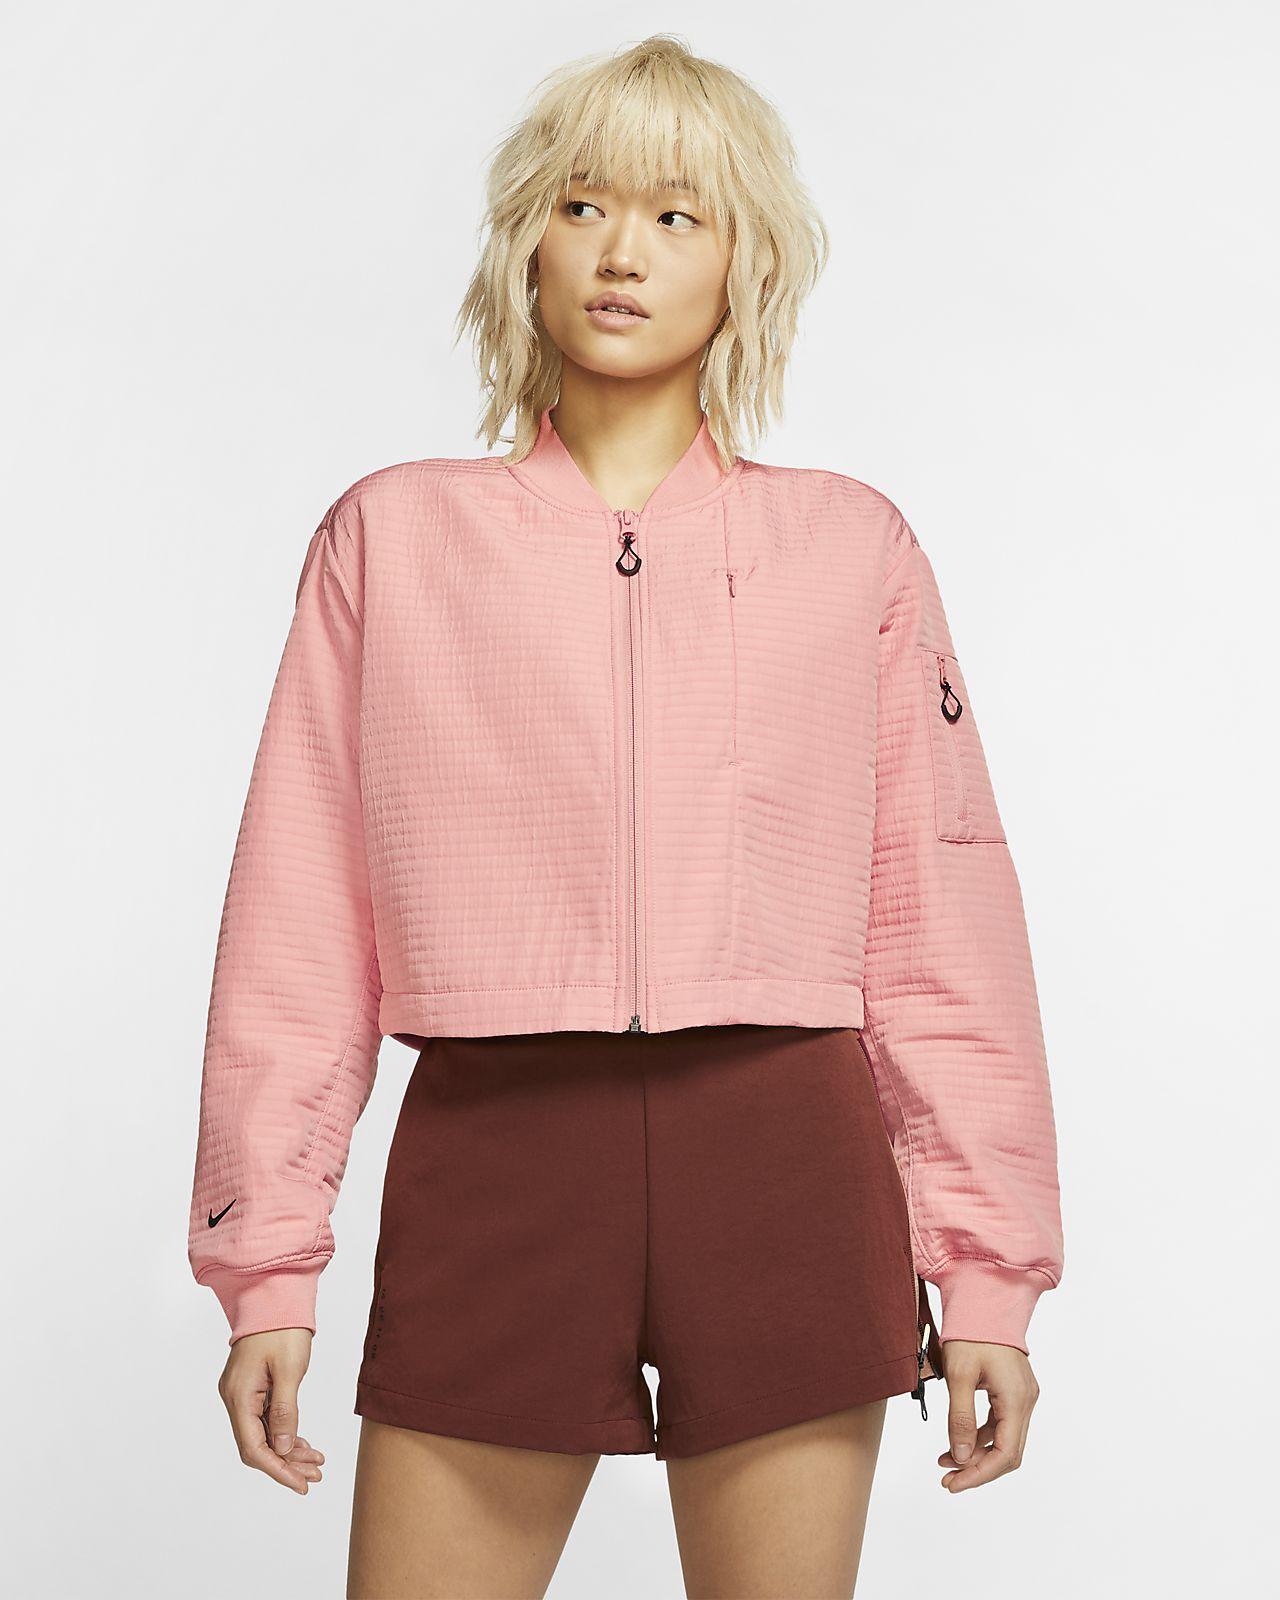 Nike Sportswear Tech Pack City Ready Kadın Bomber Ceket